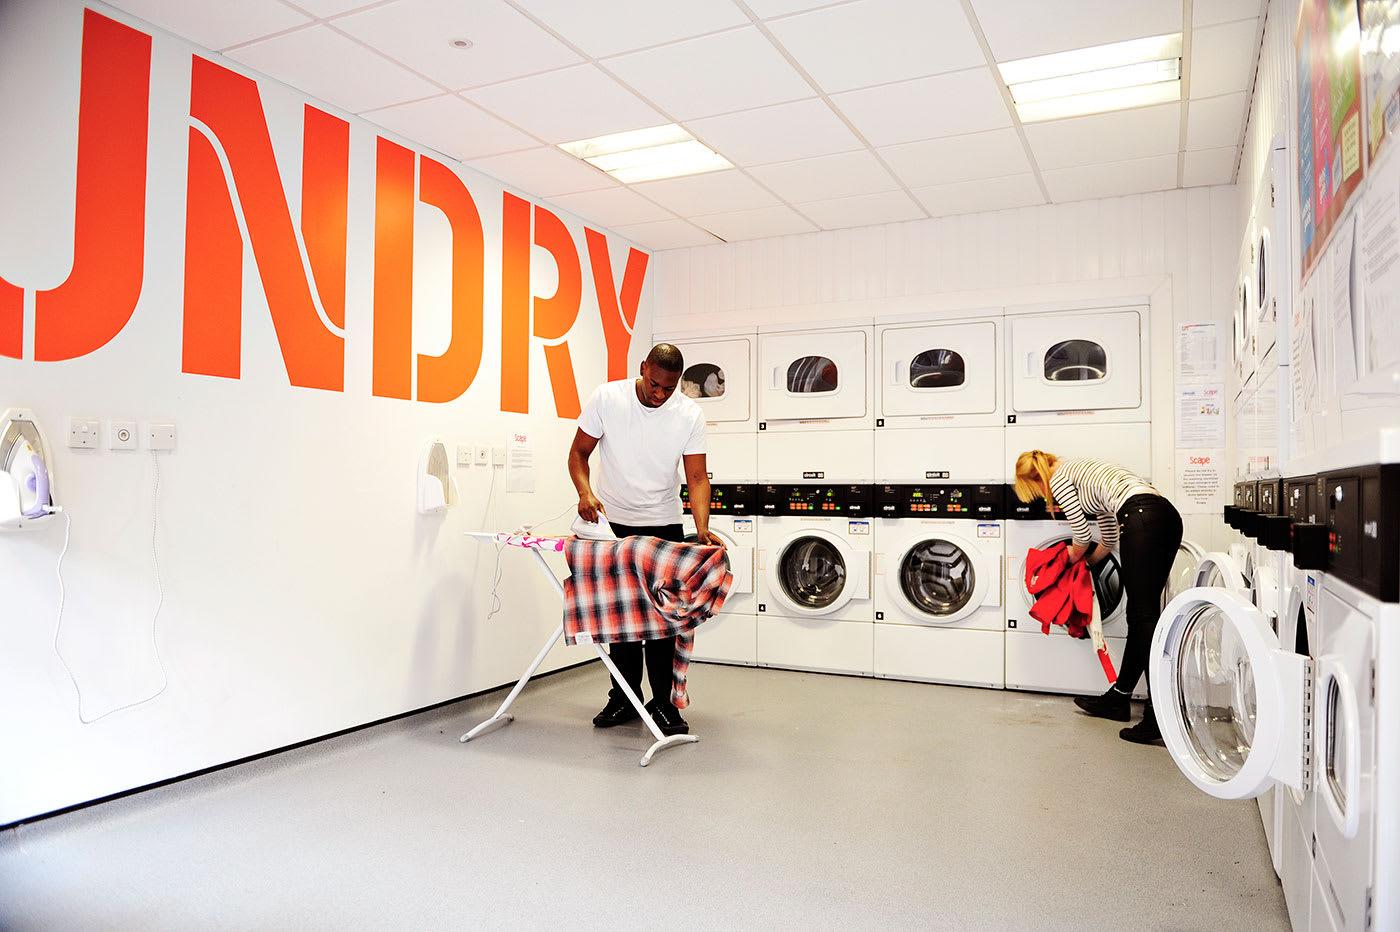 Scape洗衣设施